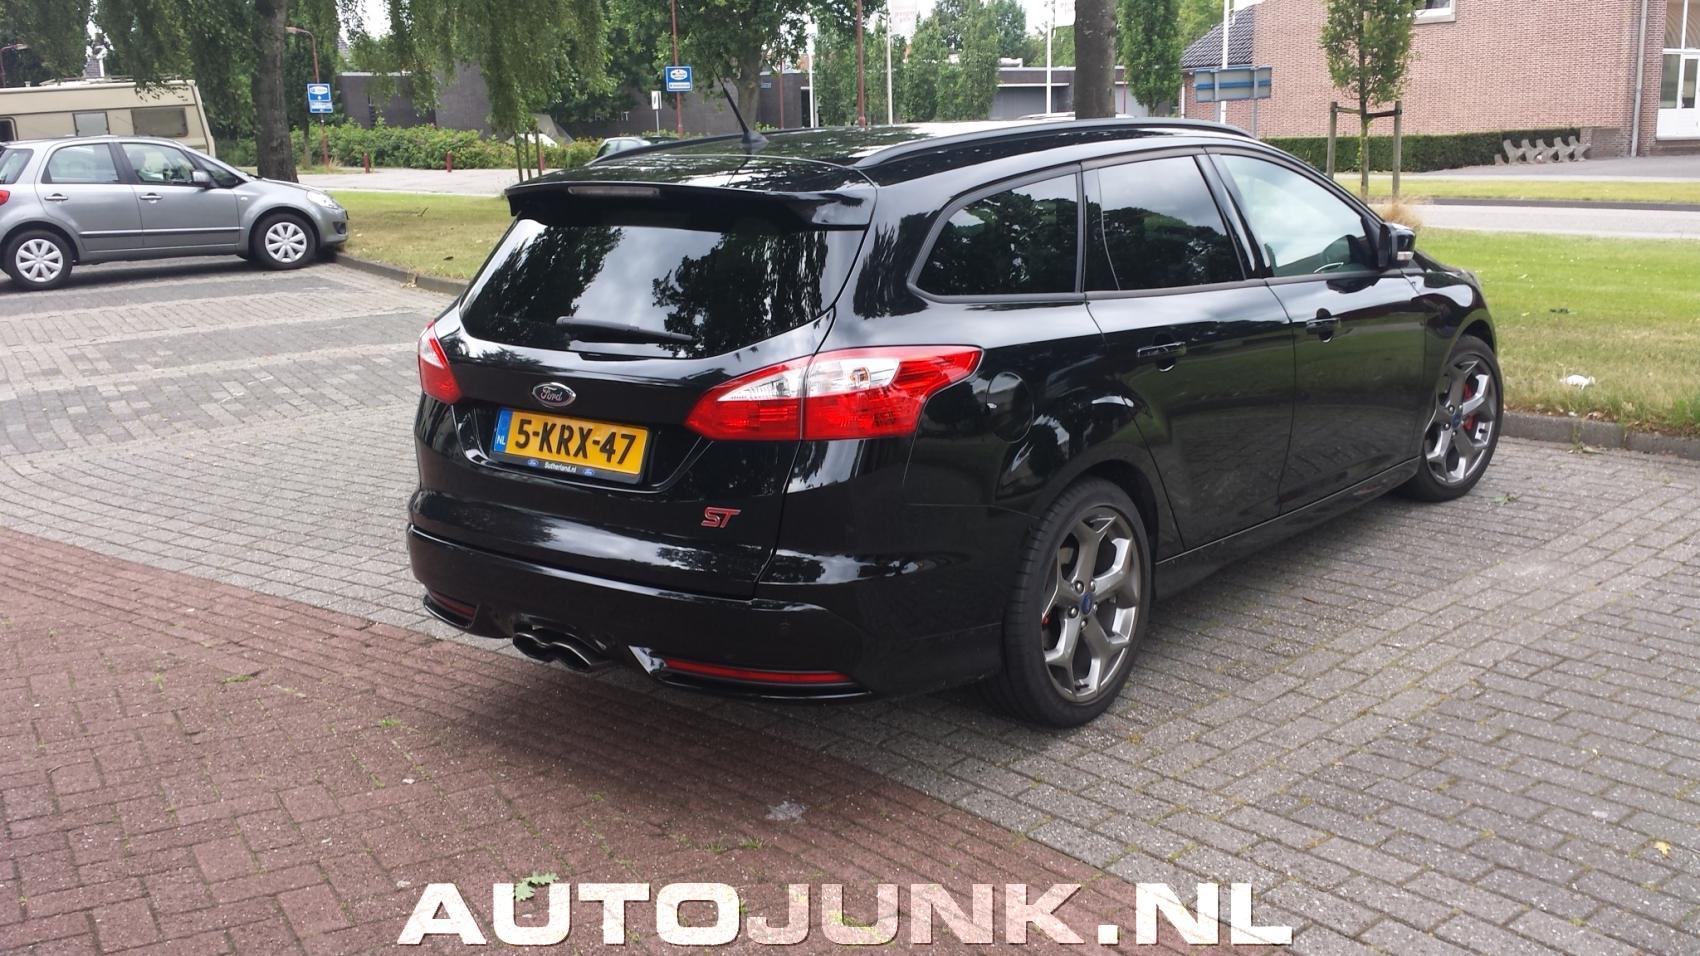 Ford Focus Wagon ST foto's » Autojunk.nl (120495)